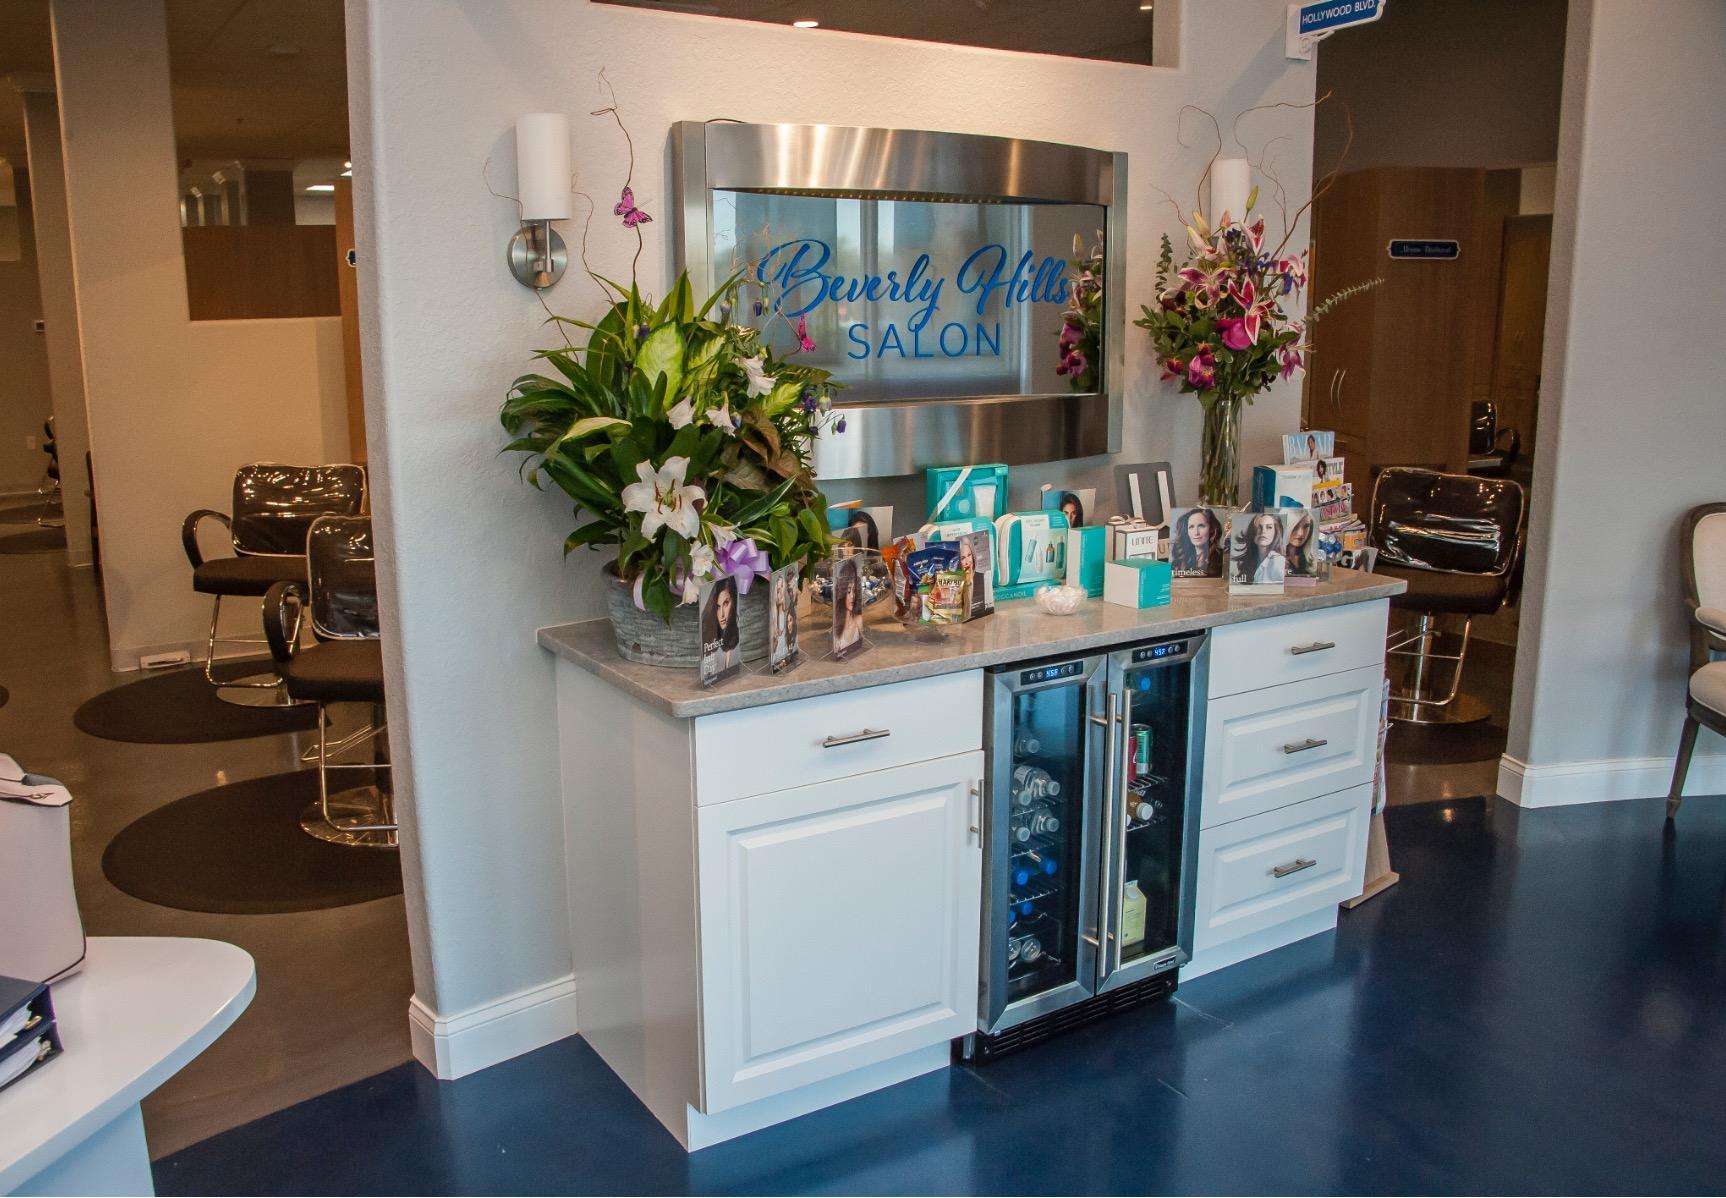 Beverly Hills Salon image 2